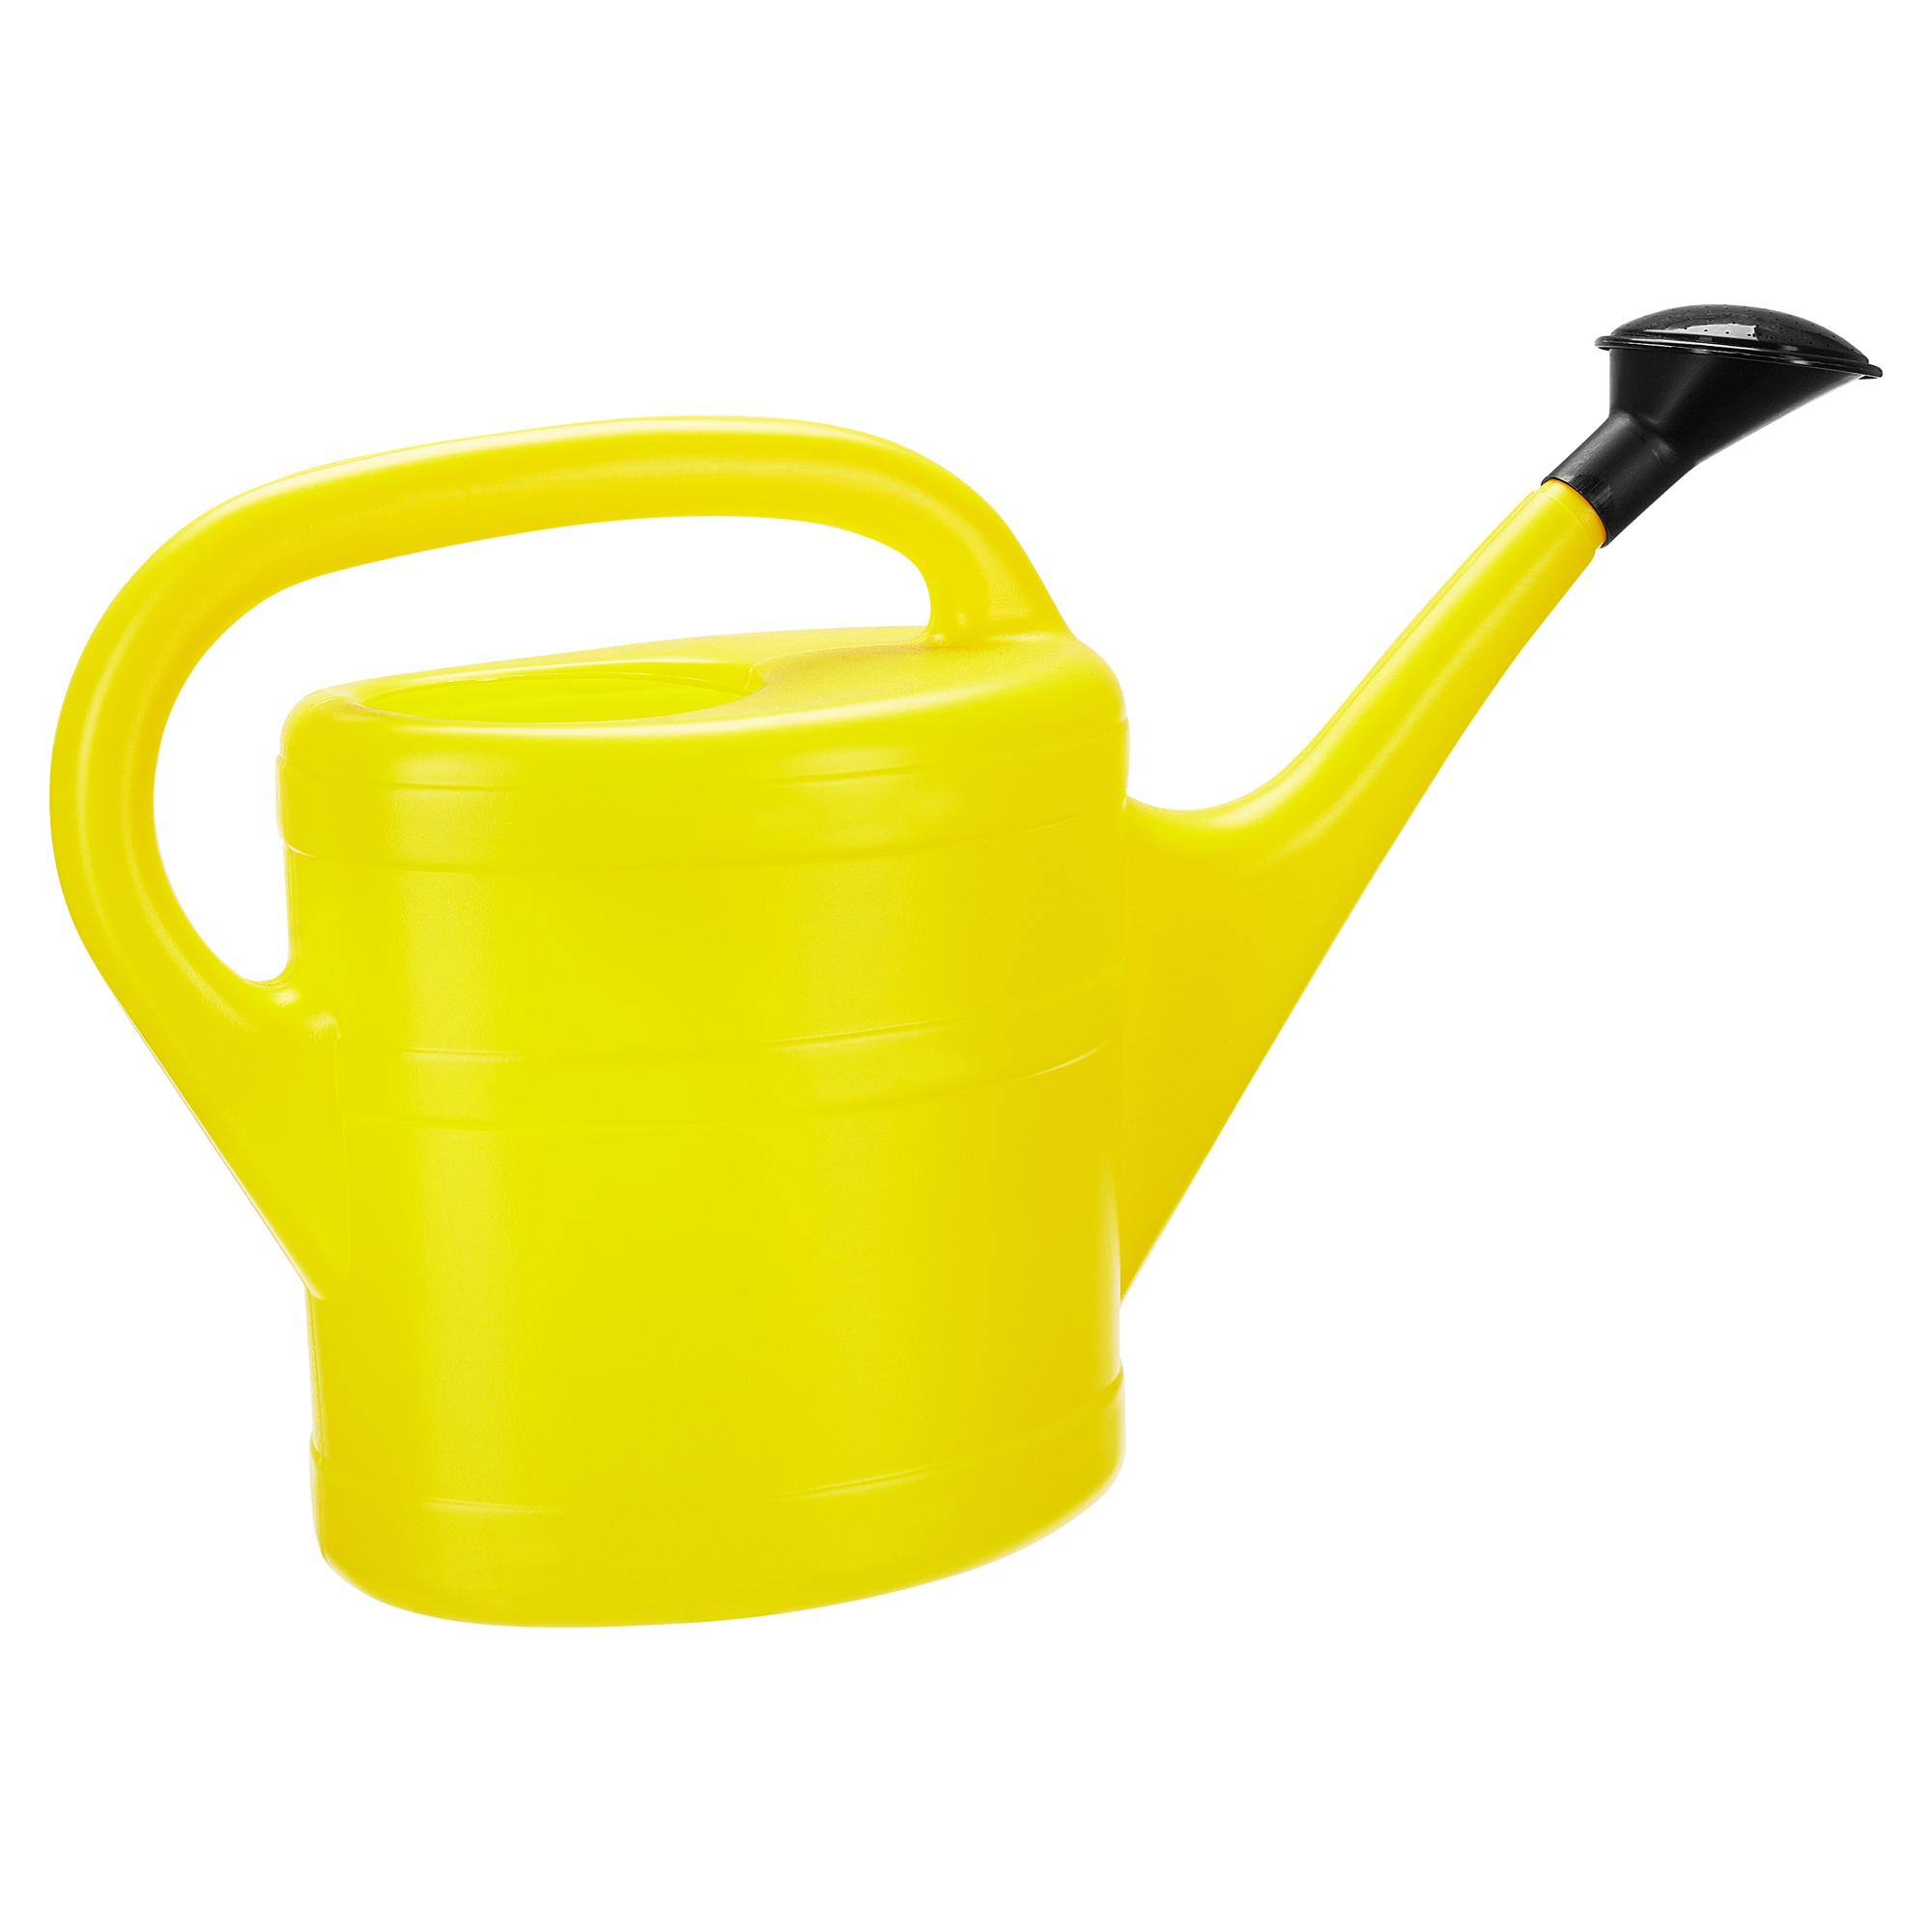 Geli Gießkanne gelb 5 l